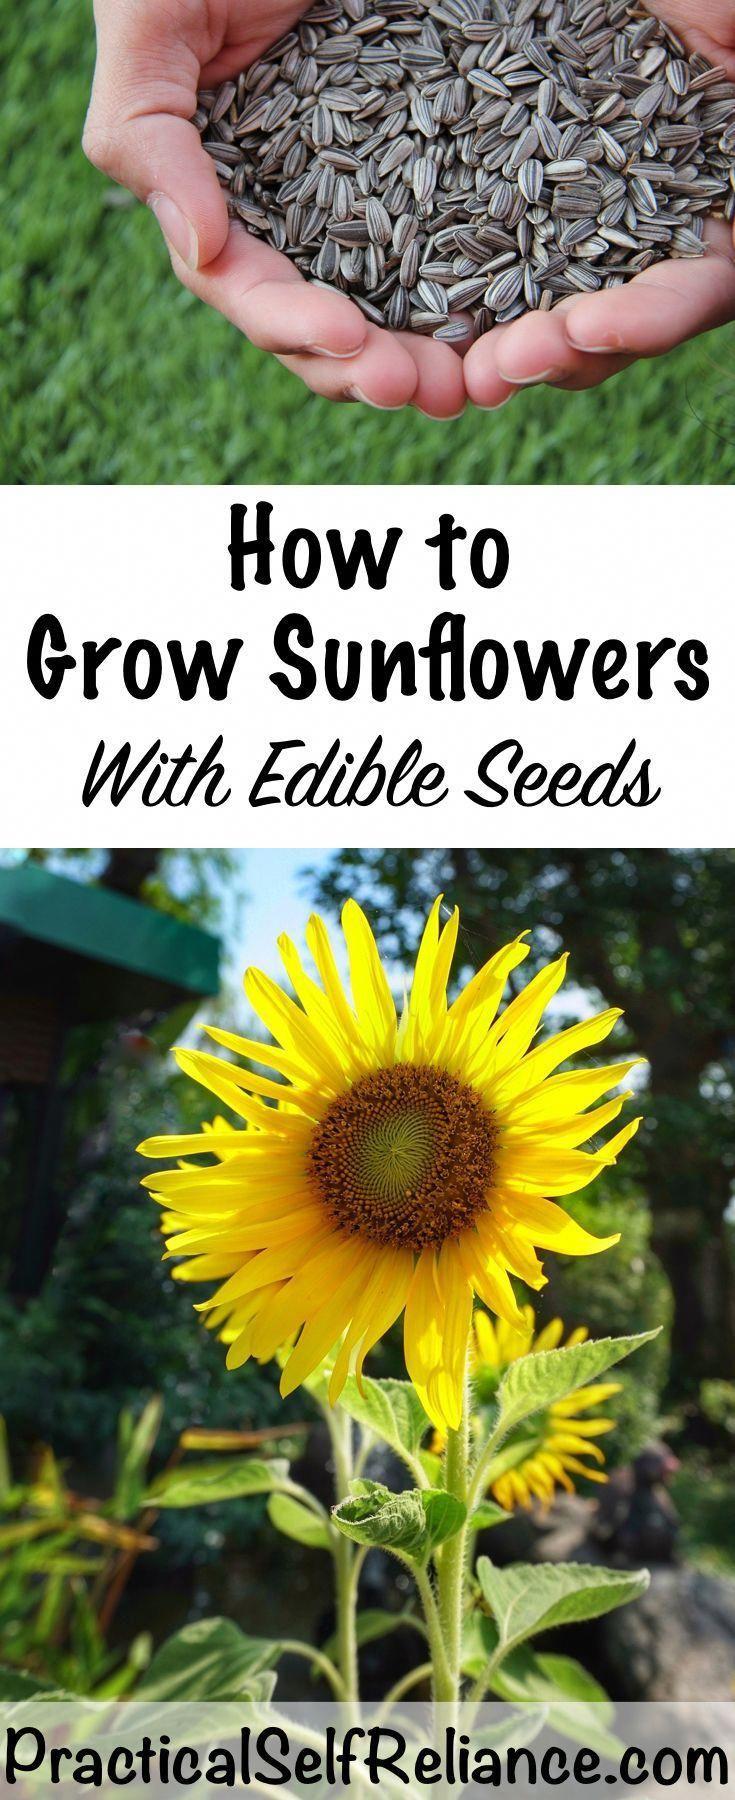 How To Grow Sunflowers For Seeds Grow Edible Sunflower Seeds Howtogardening Growing Sunflowers Planting Sunflowers Growing Vegetables